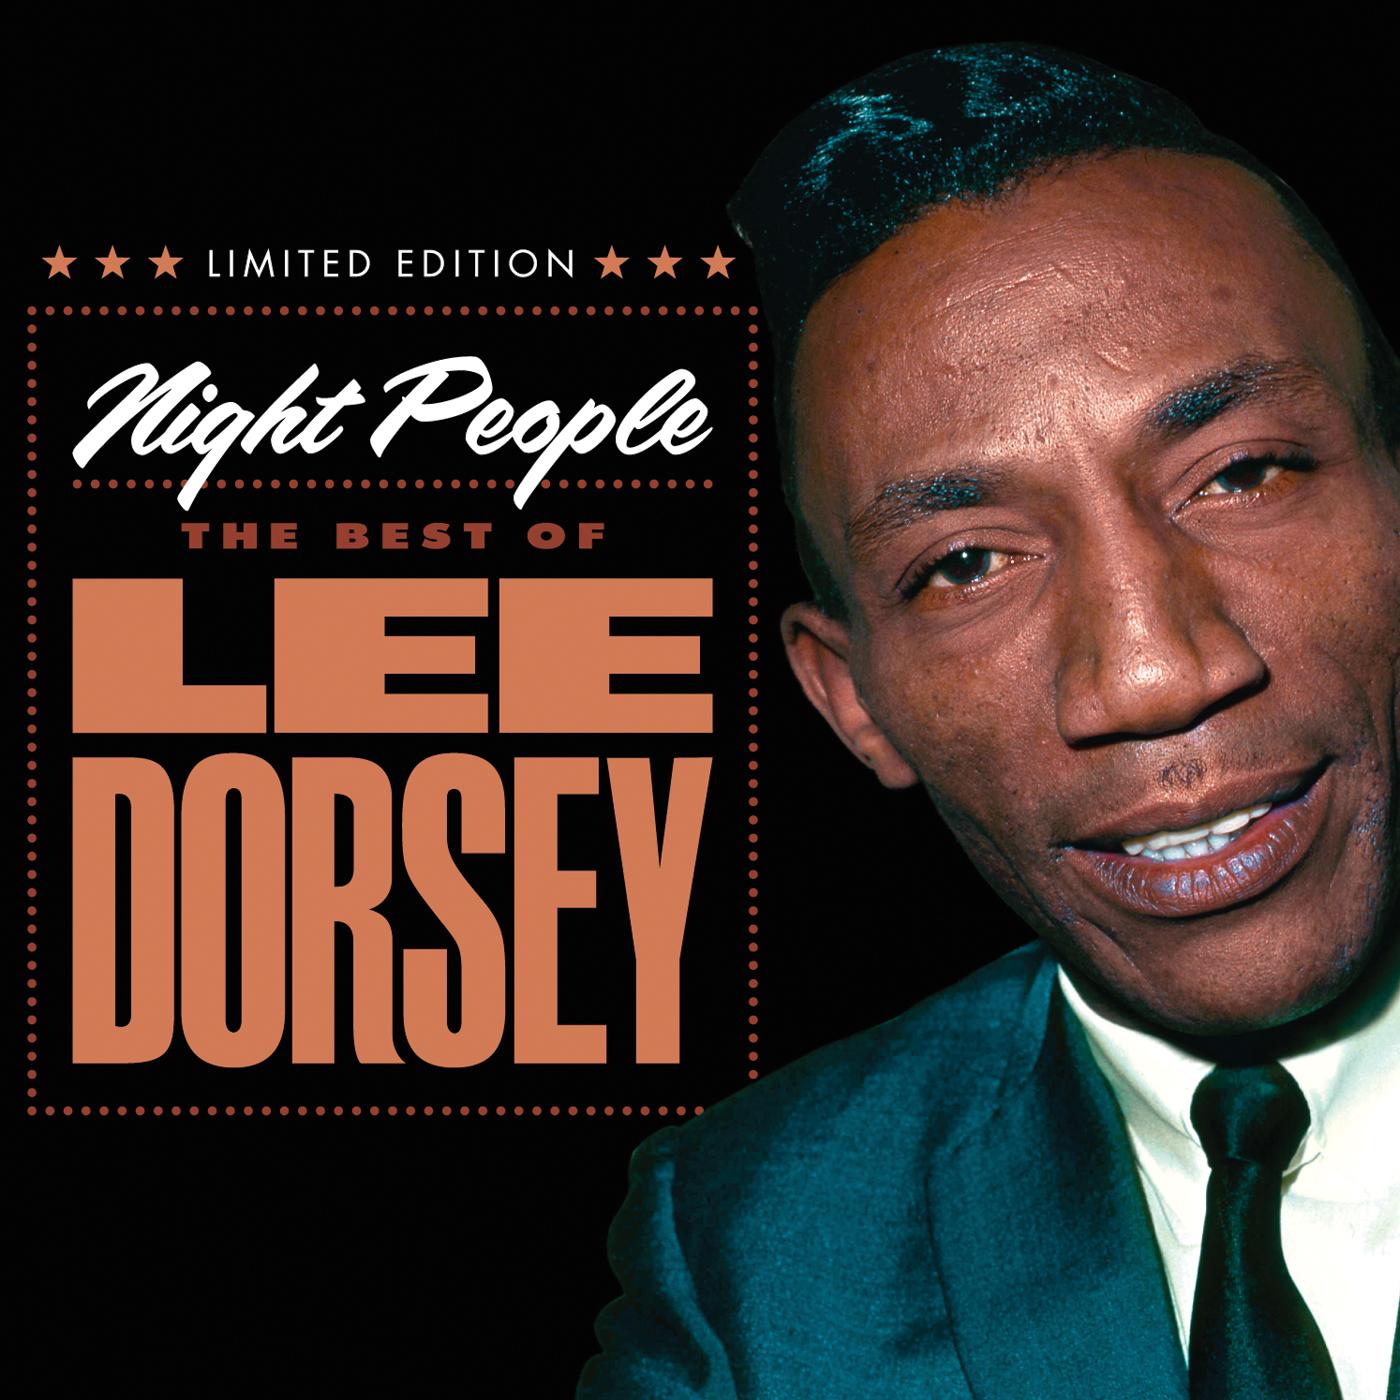 Lee Dorsey Cover 1400x1400.jpg